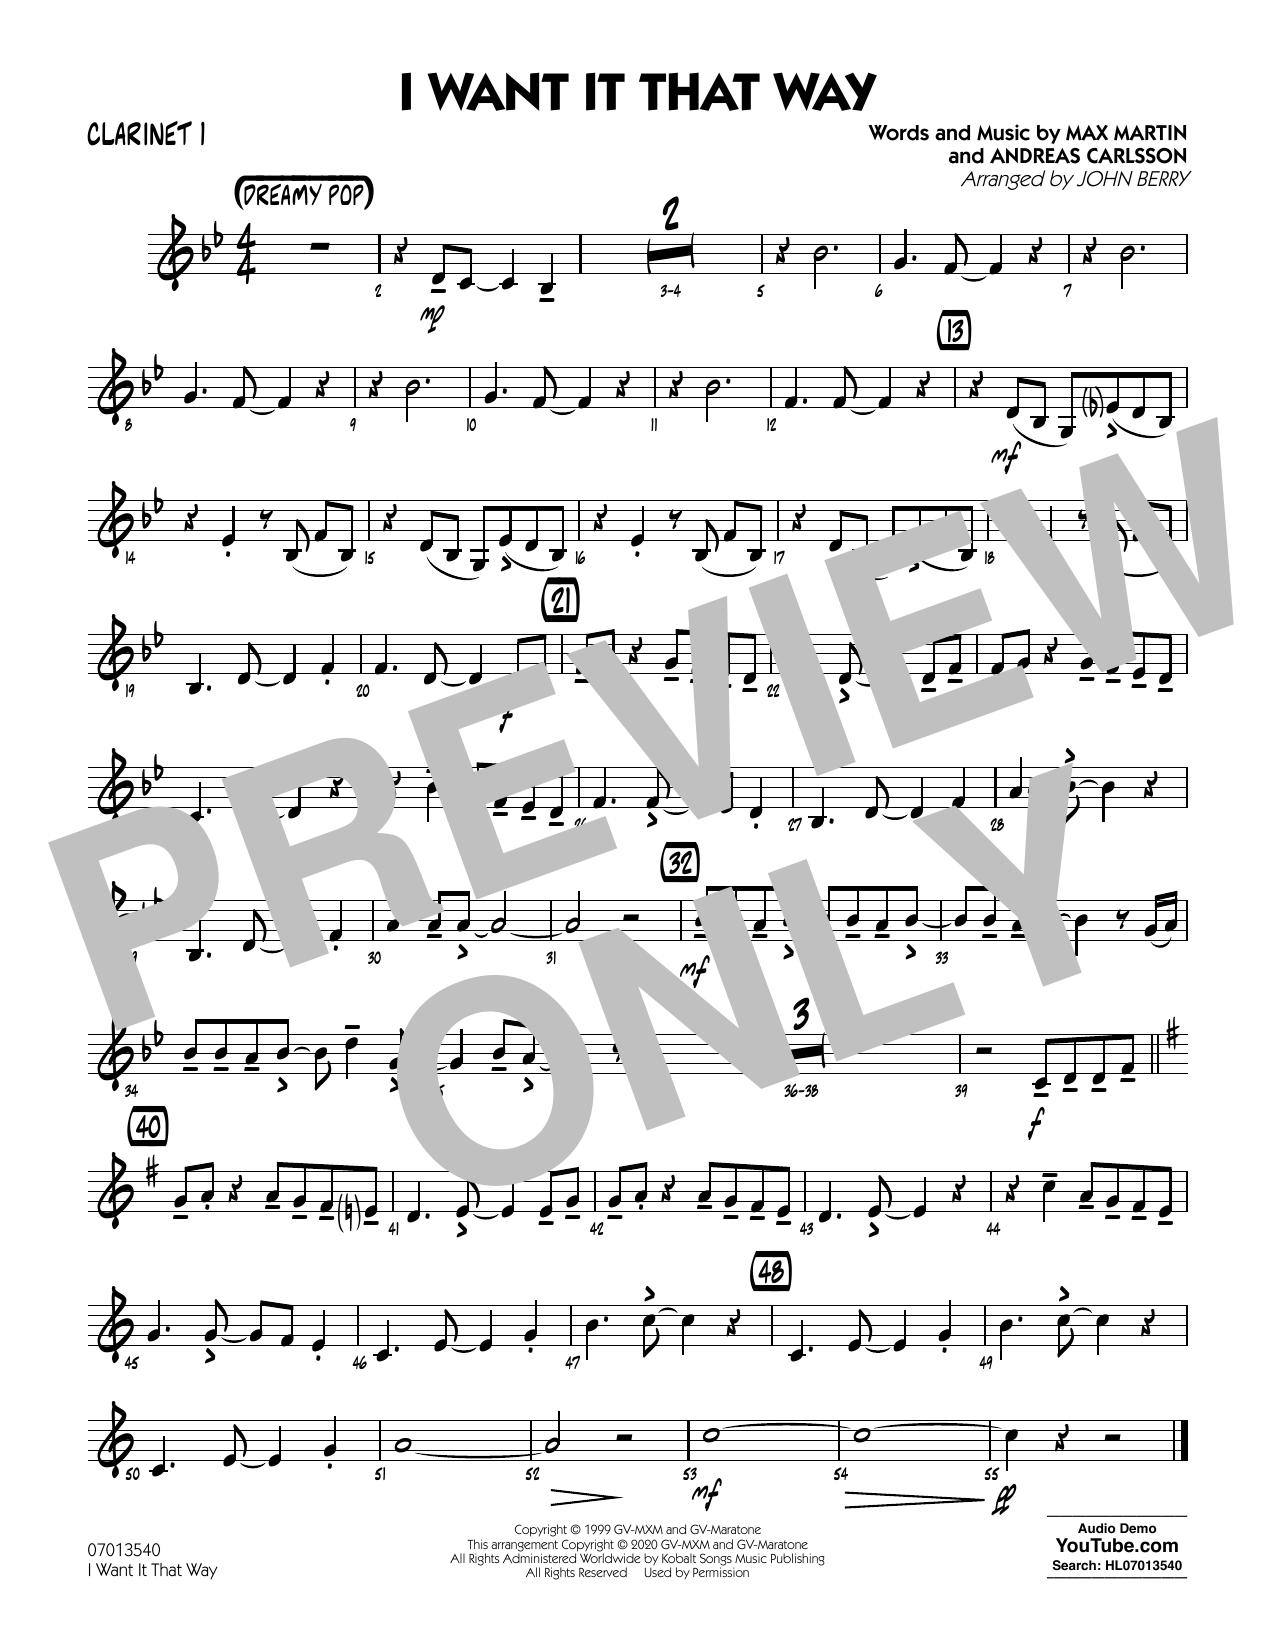 I Want It That Way (arr. John Berry) - Clarinet 1 Sheet Music